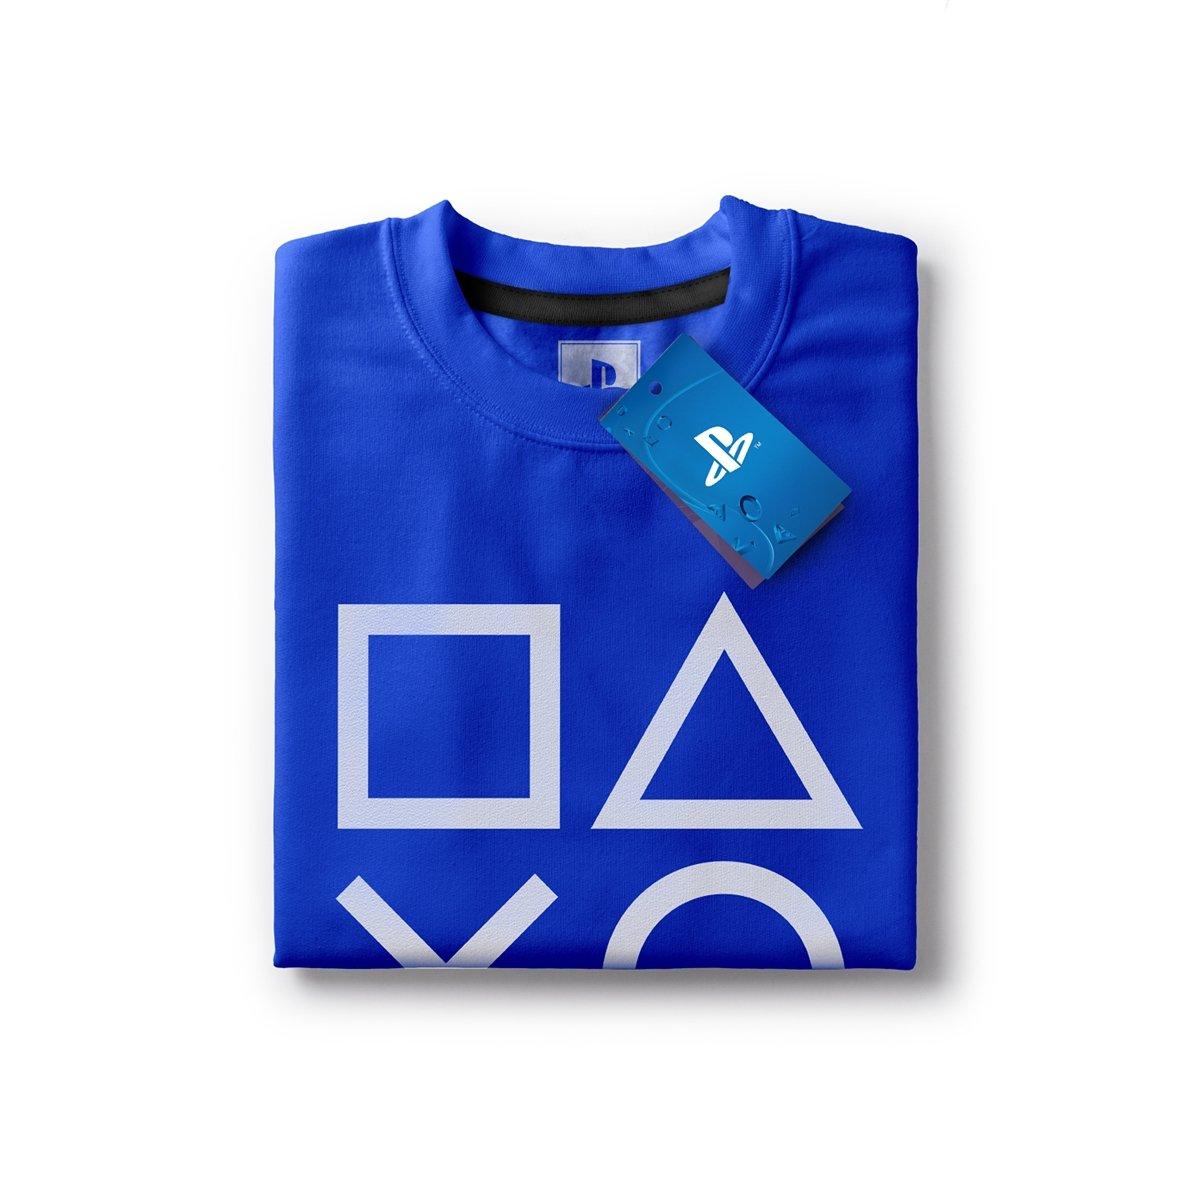 da69cacf57 Camiseta Playstation Classic Symbols Masculina - Azul - Compre Agora ...